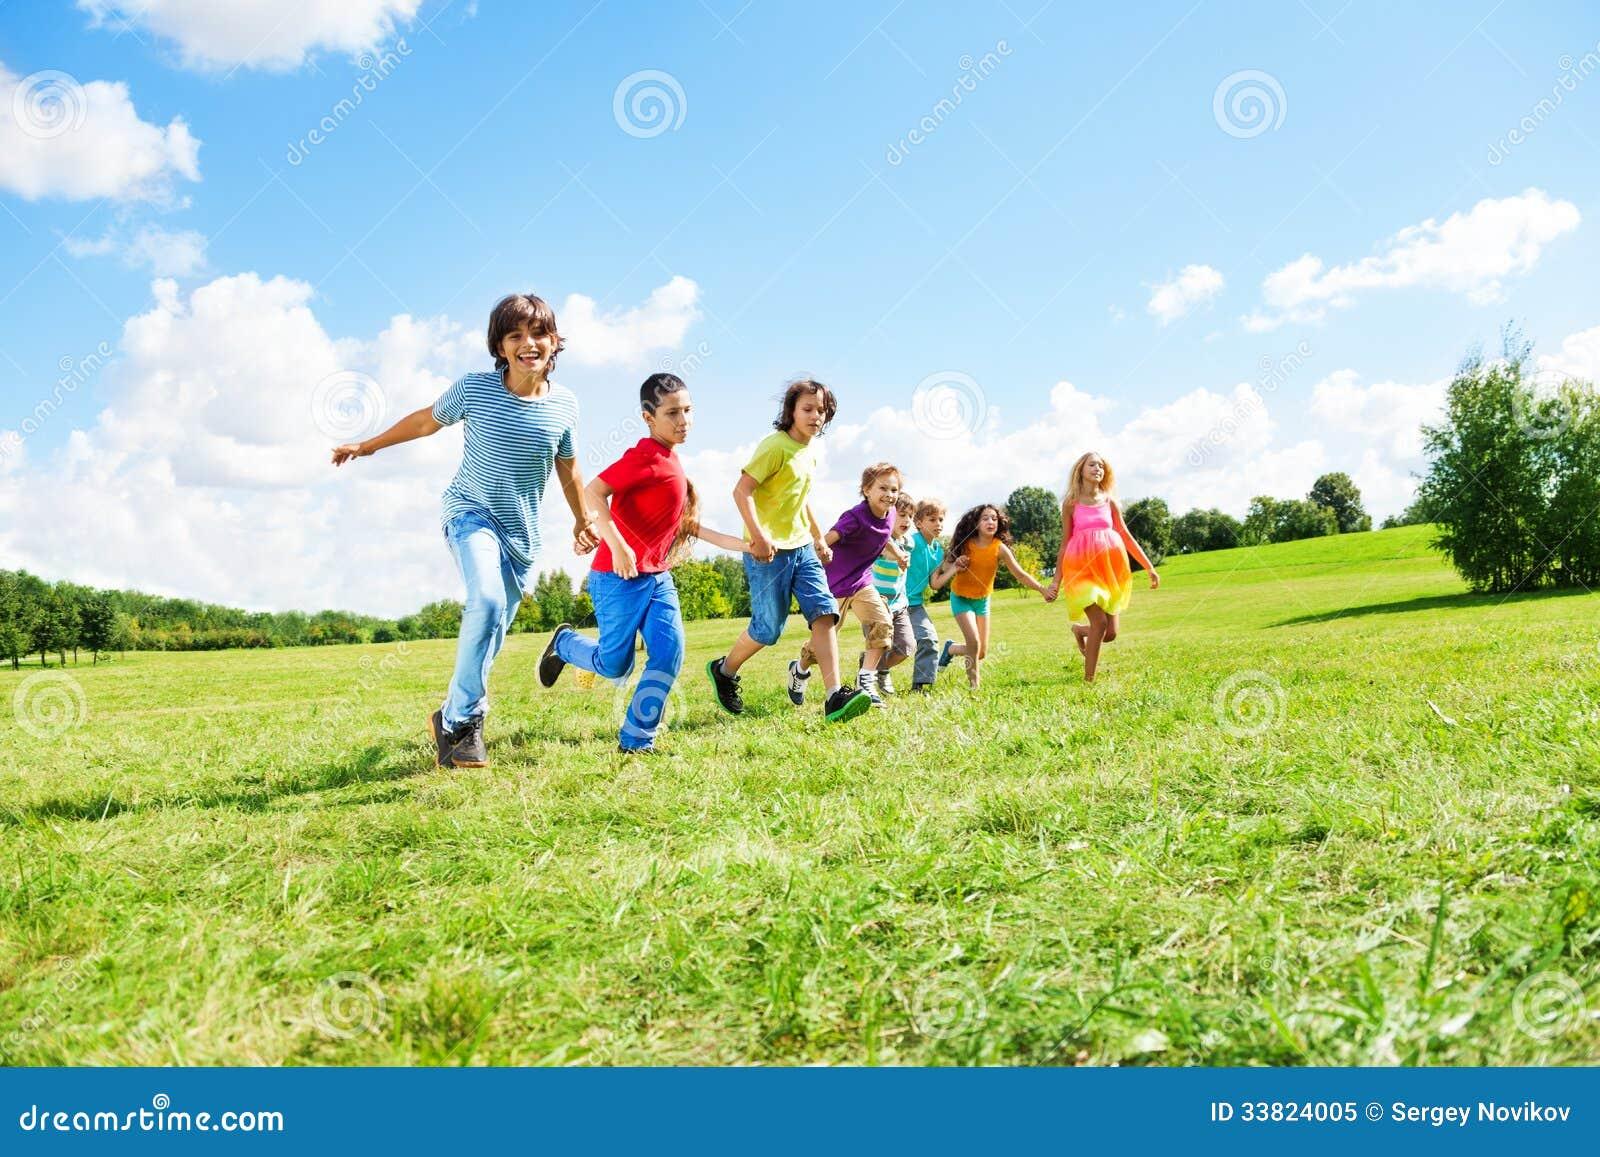 many boys and girls running royalty free stock photo